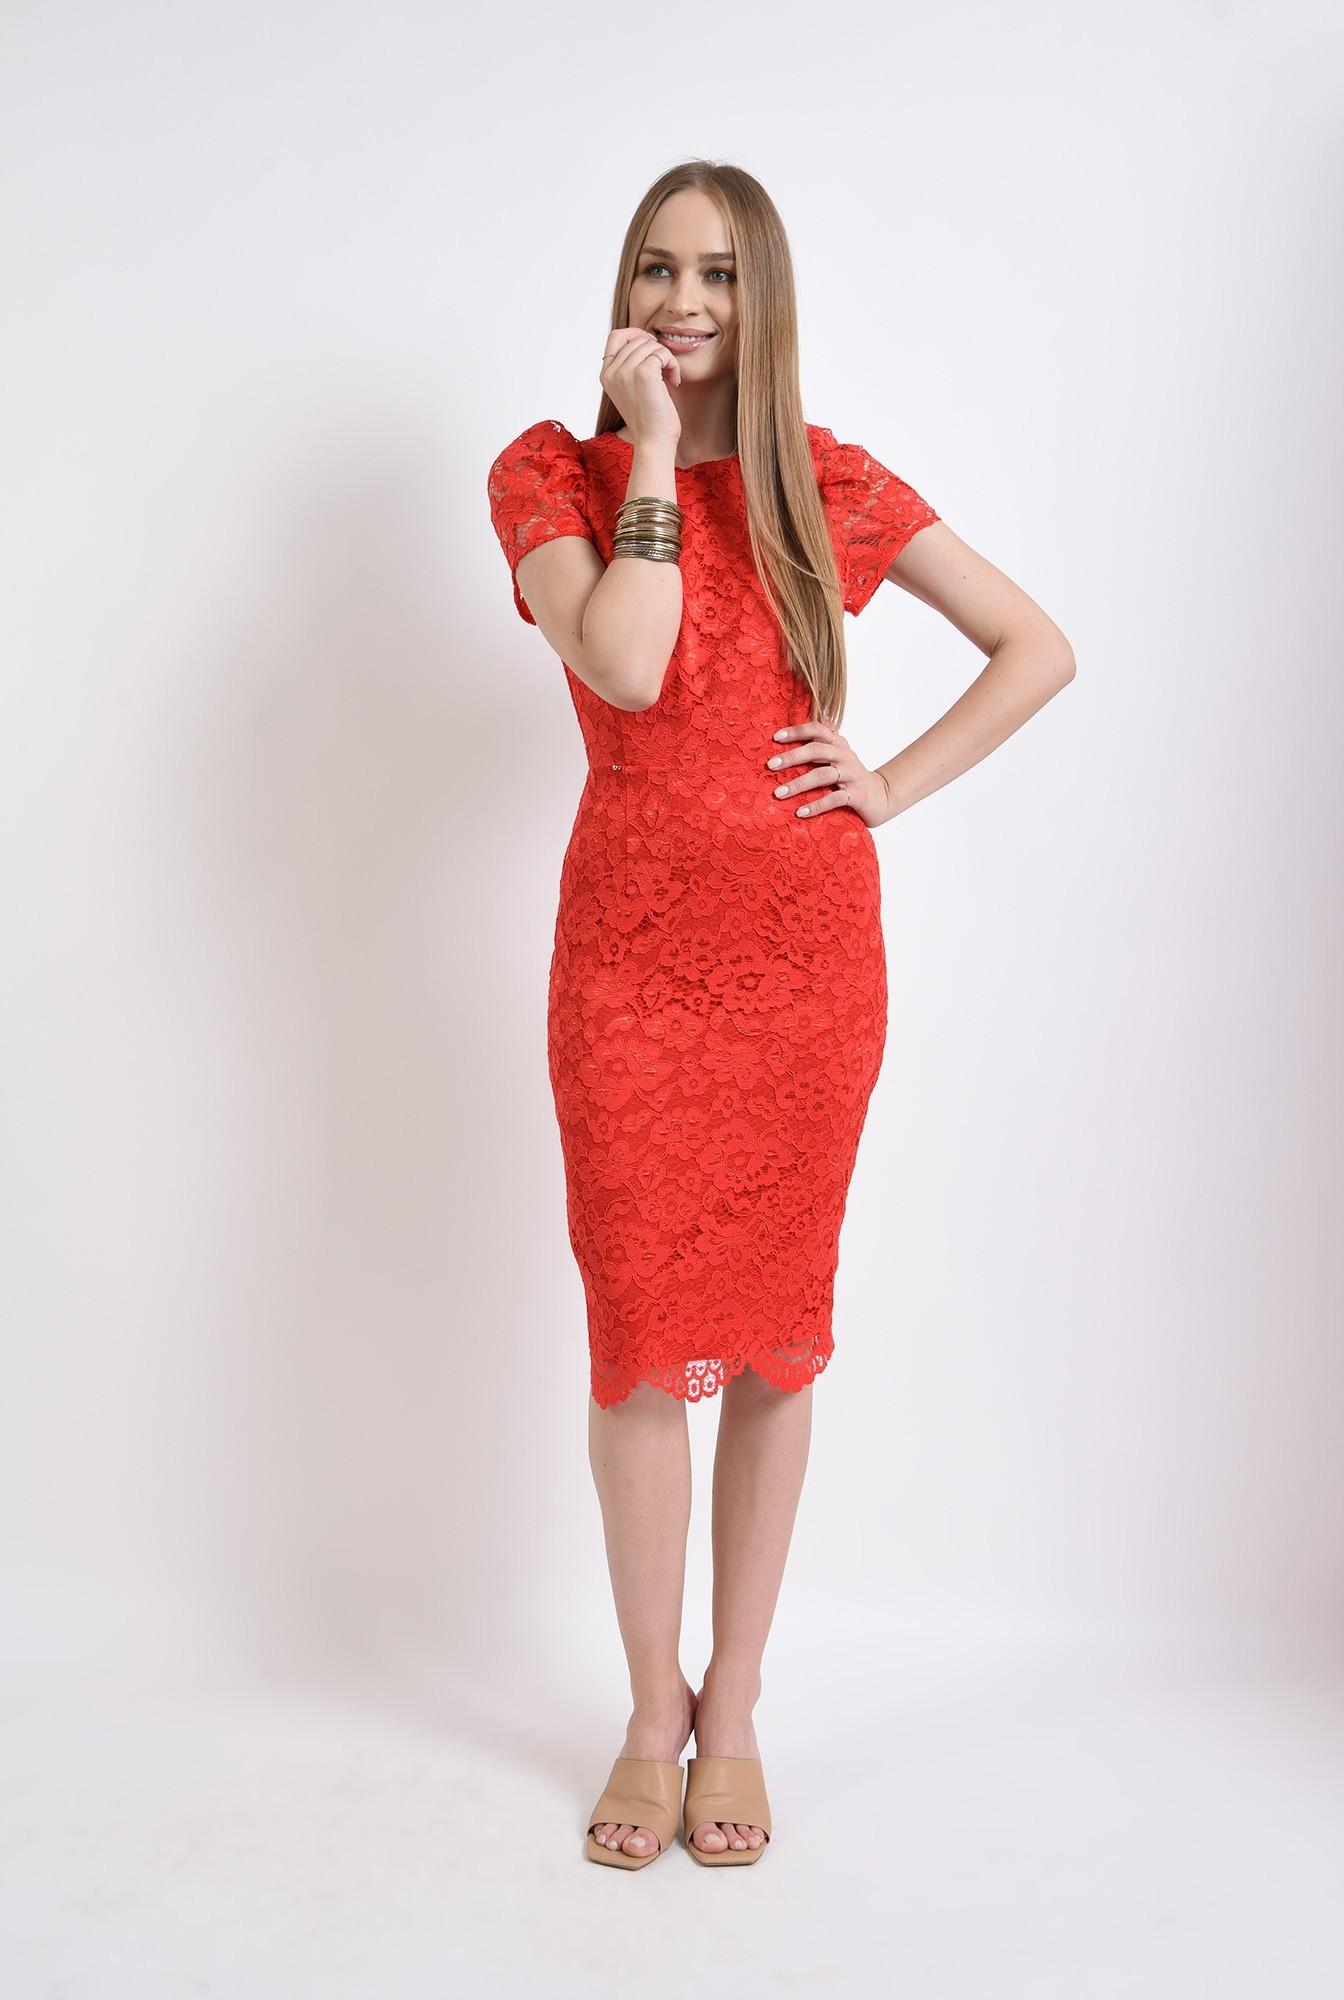 0 - rochie rosie, din dantela, conica